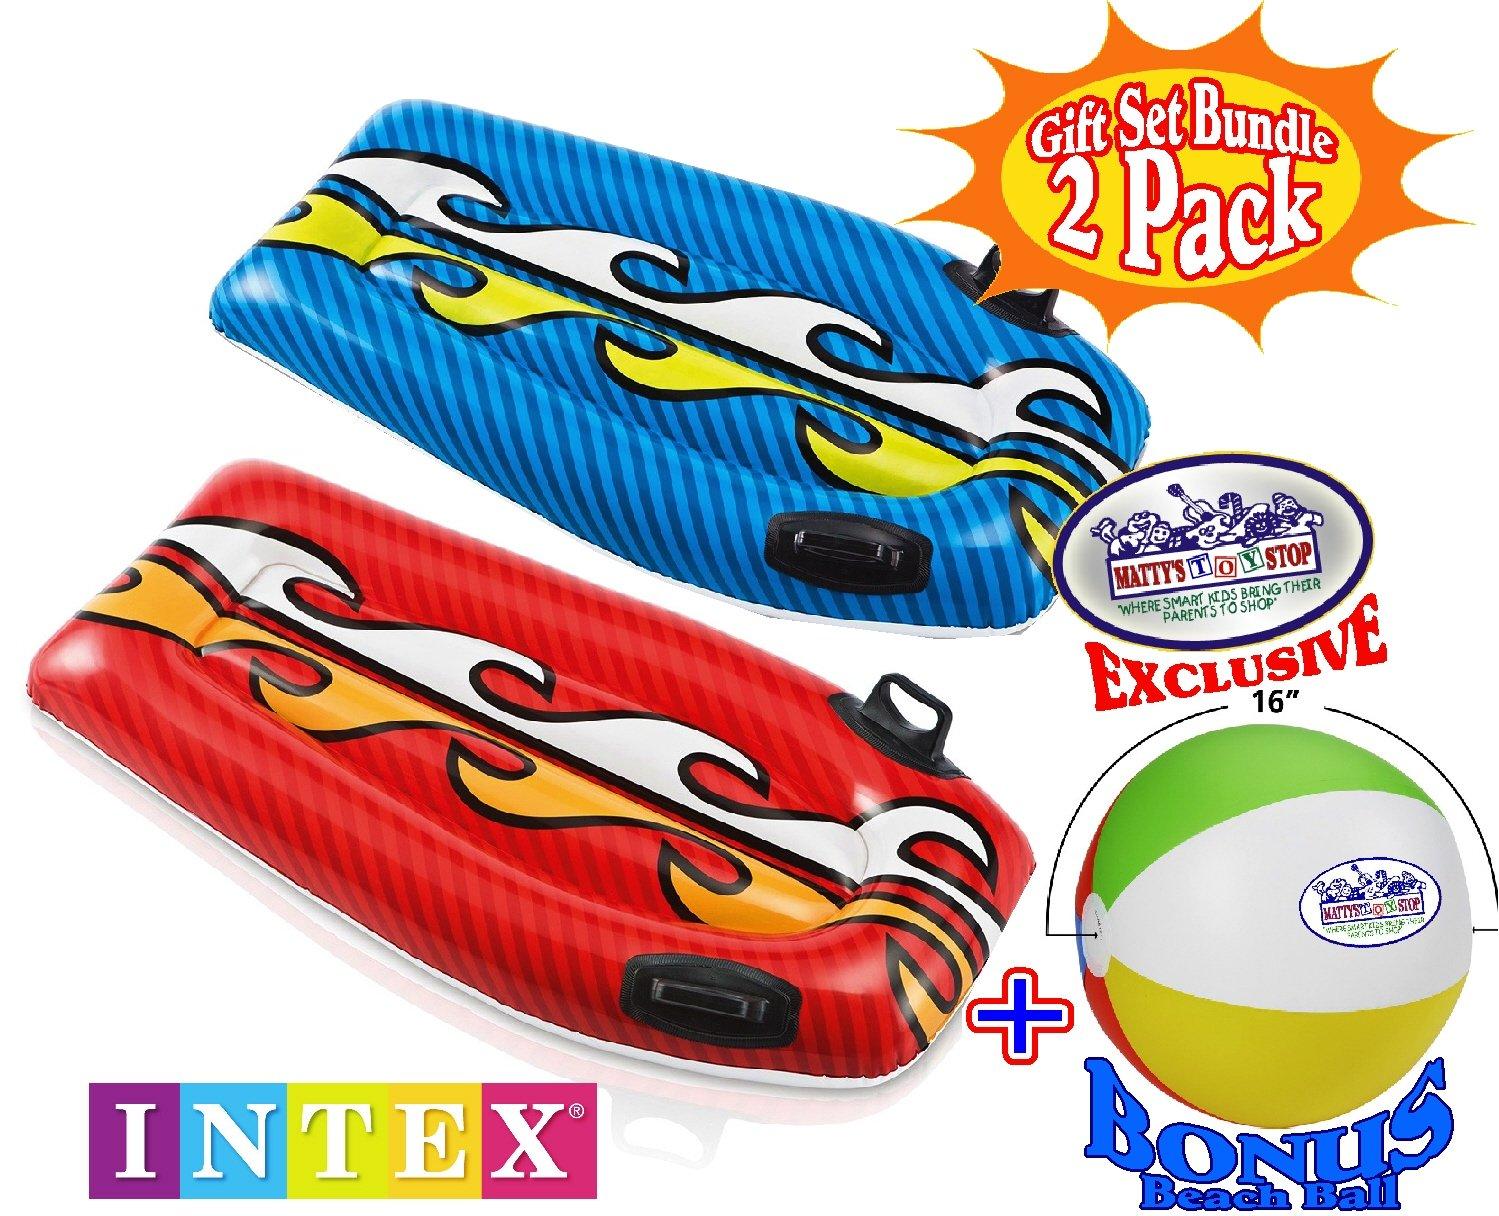 Intex Joy Rider Surf 'n Slide Pool Floats